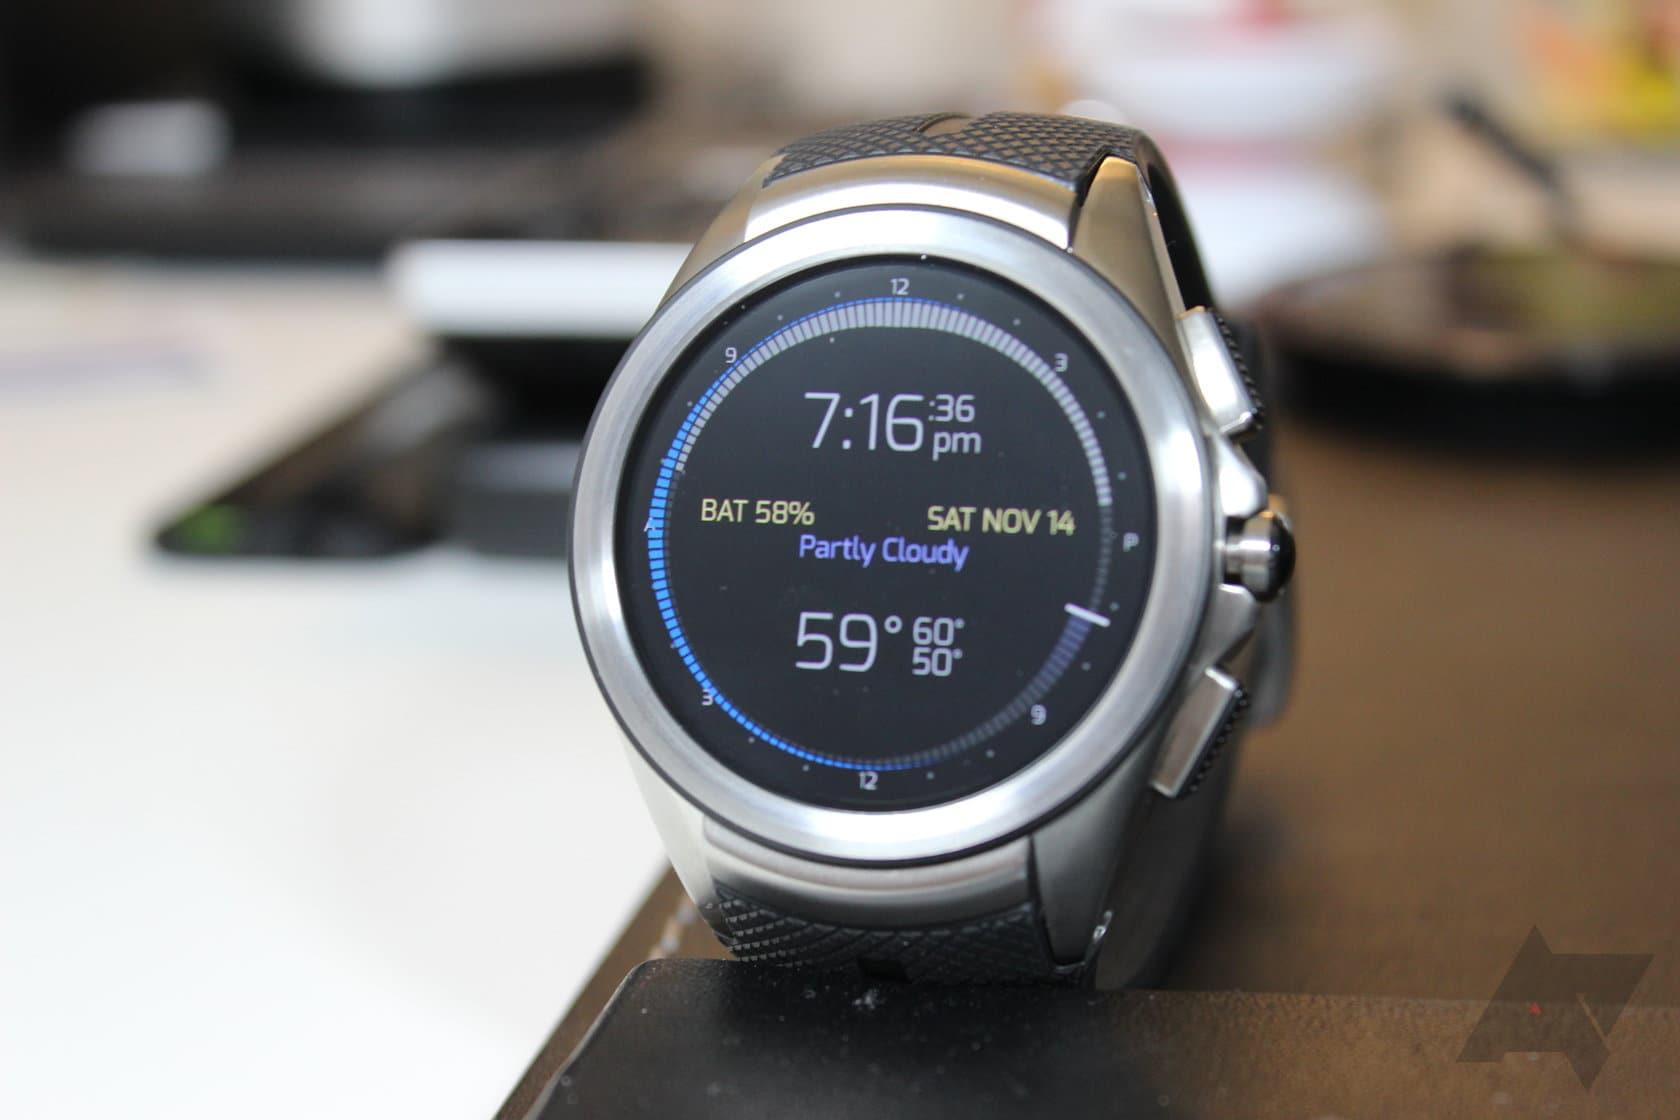 LG Watch Urbane LTE – 8